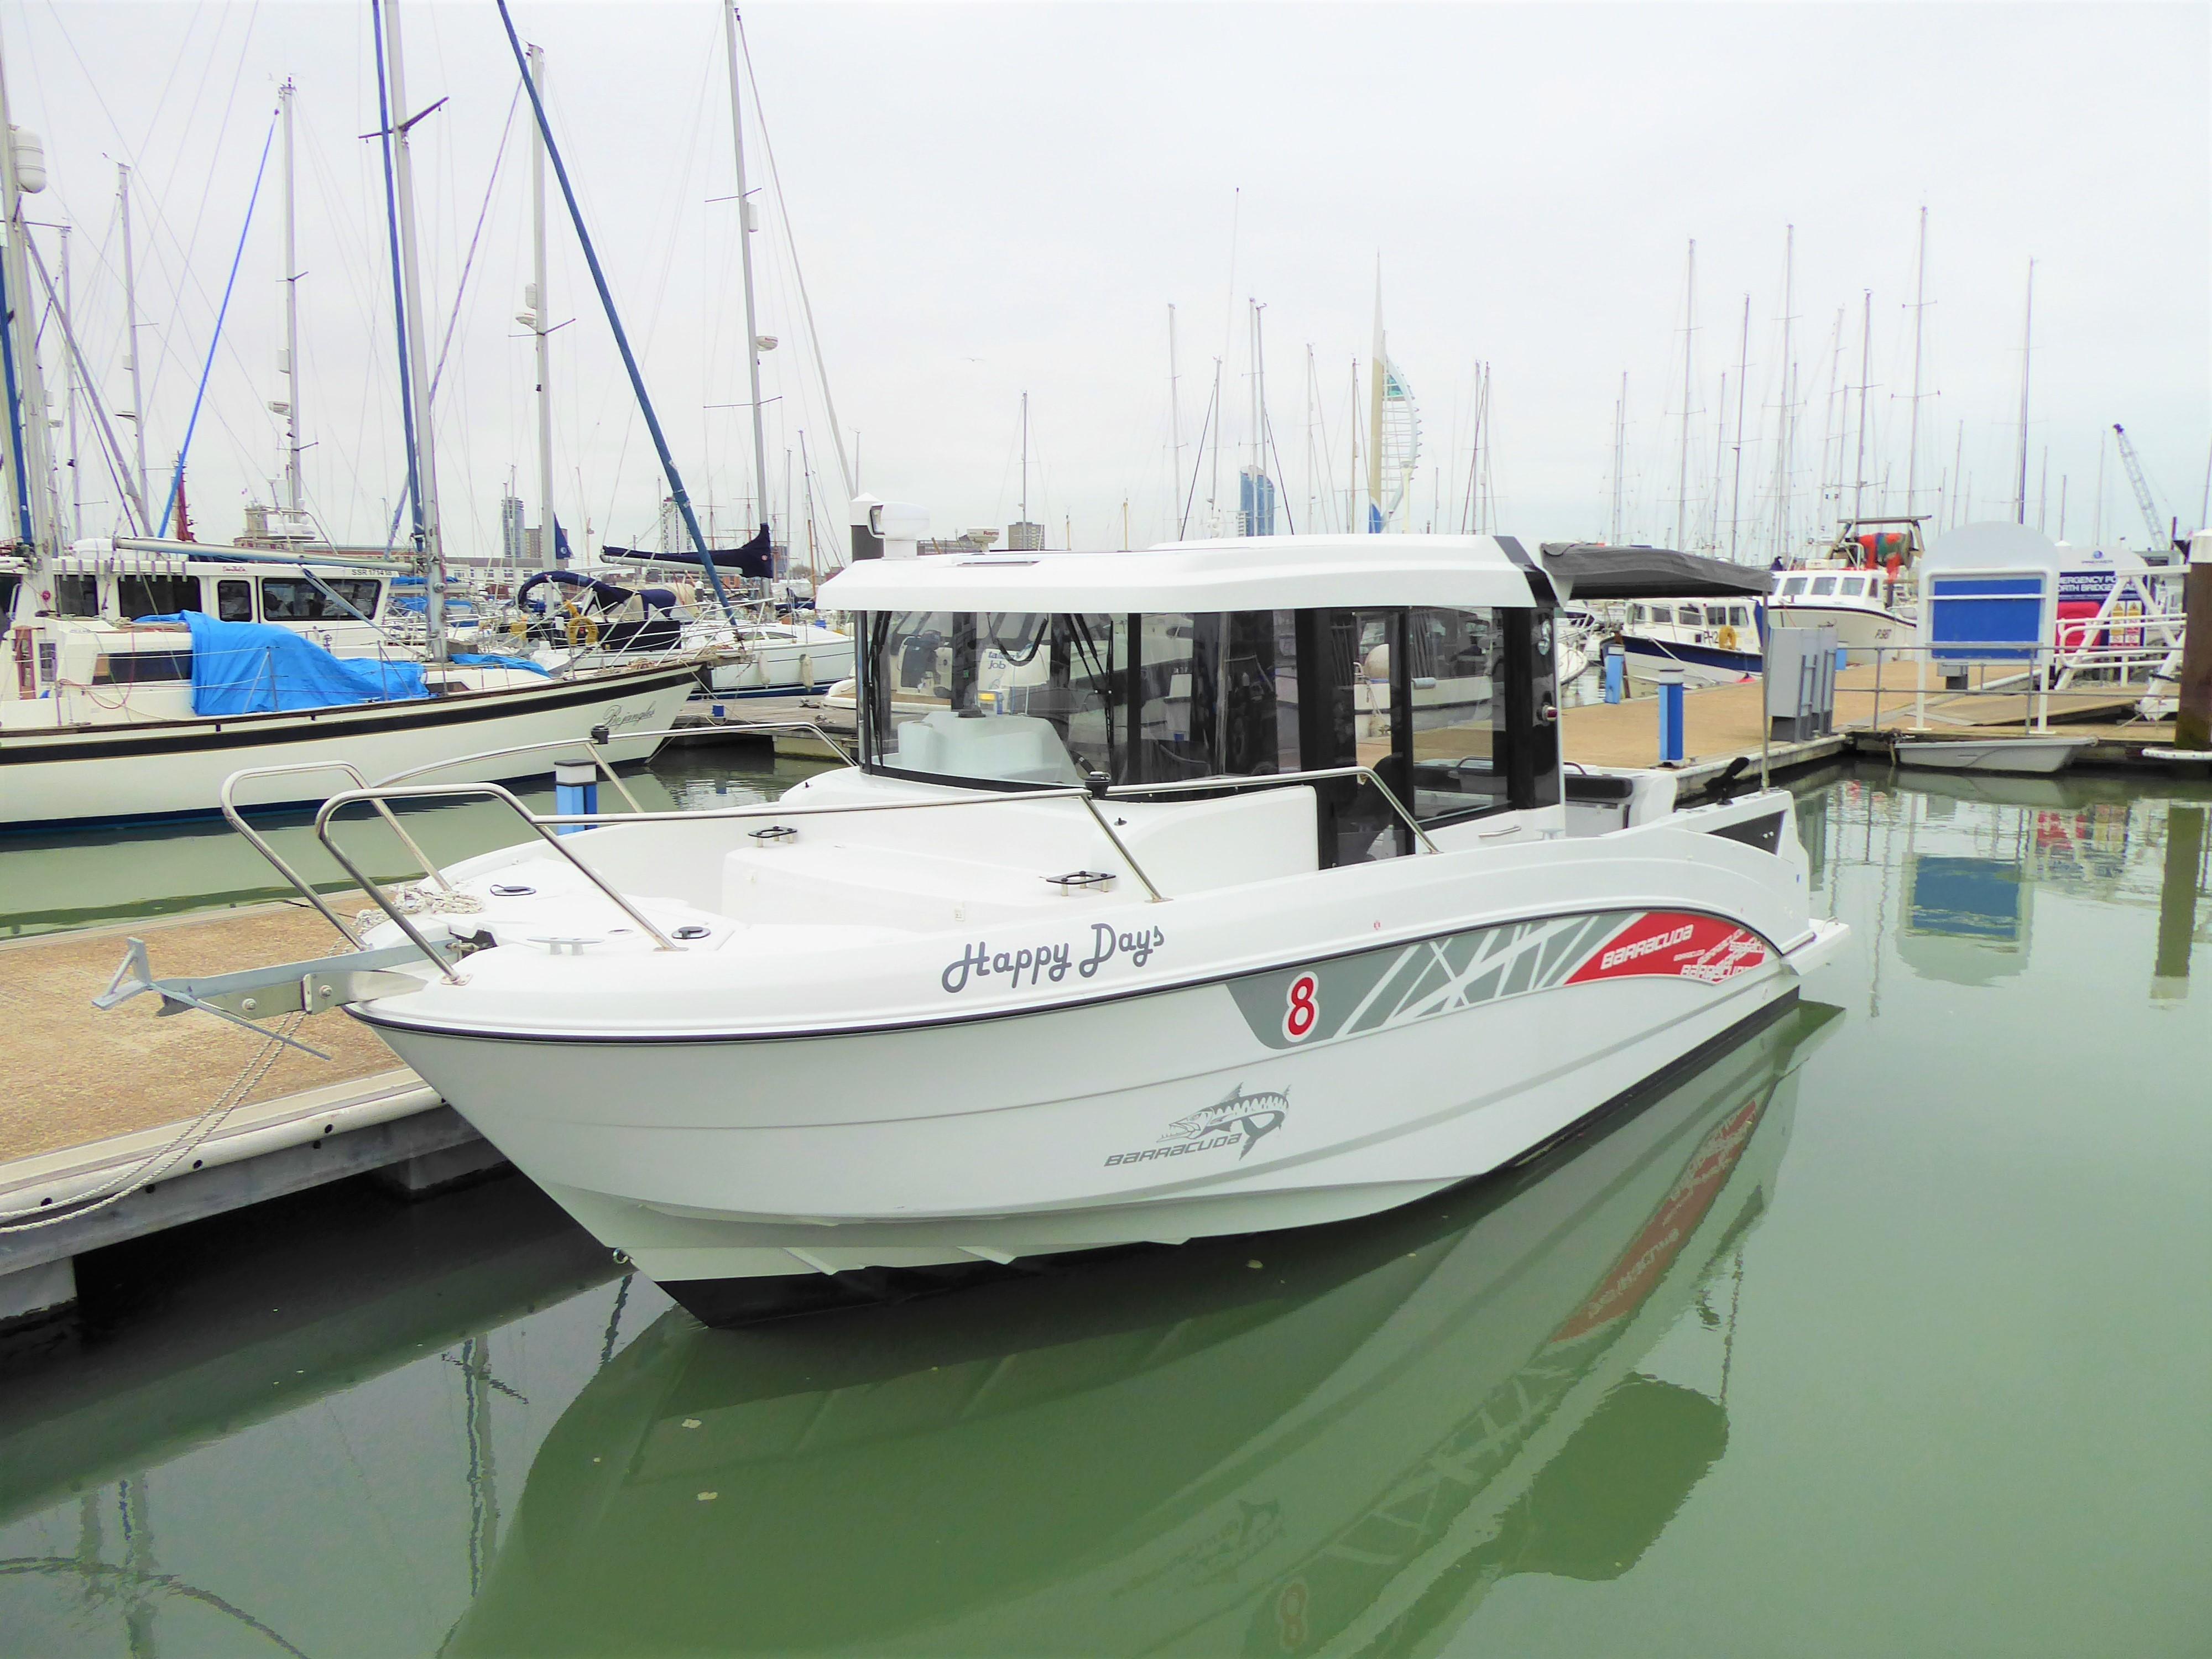 Beneteau BARRACUDA 8 Barracuda 8 - For Sale